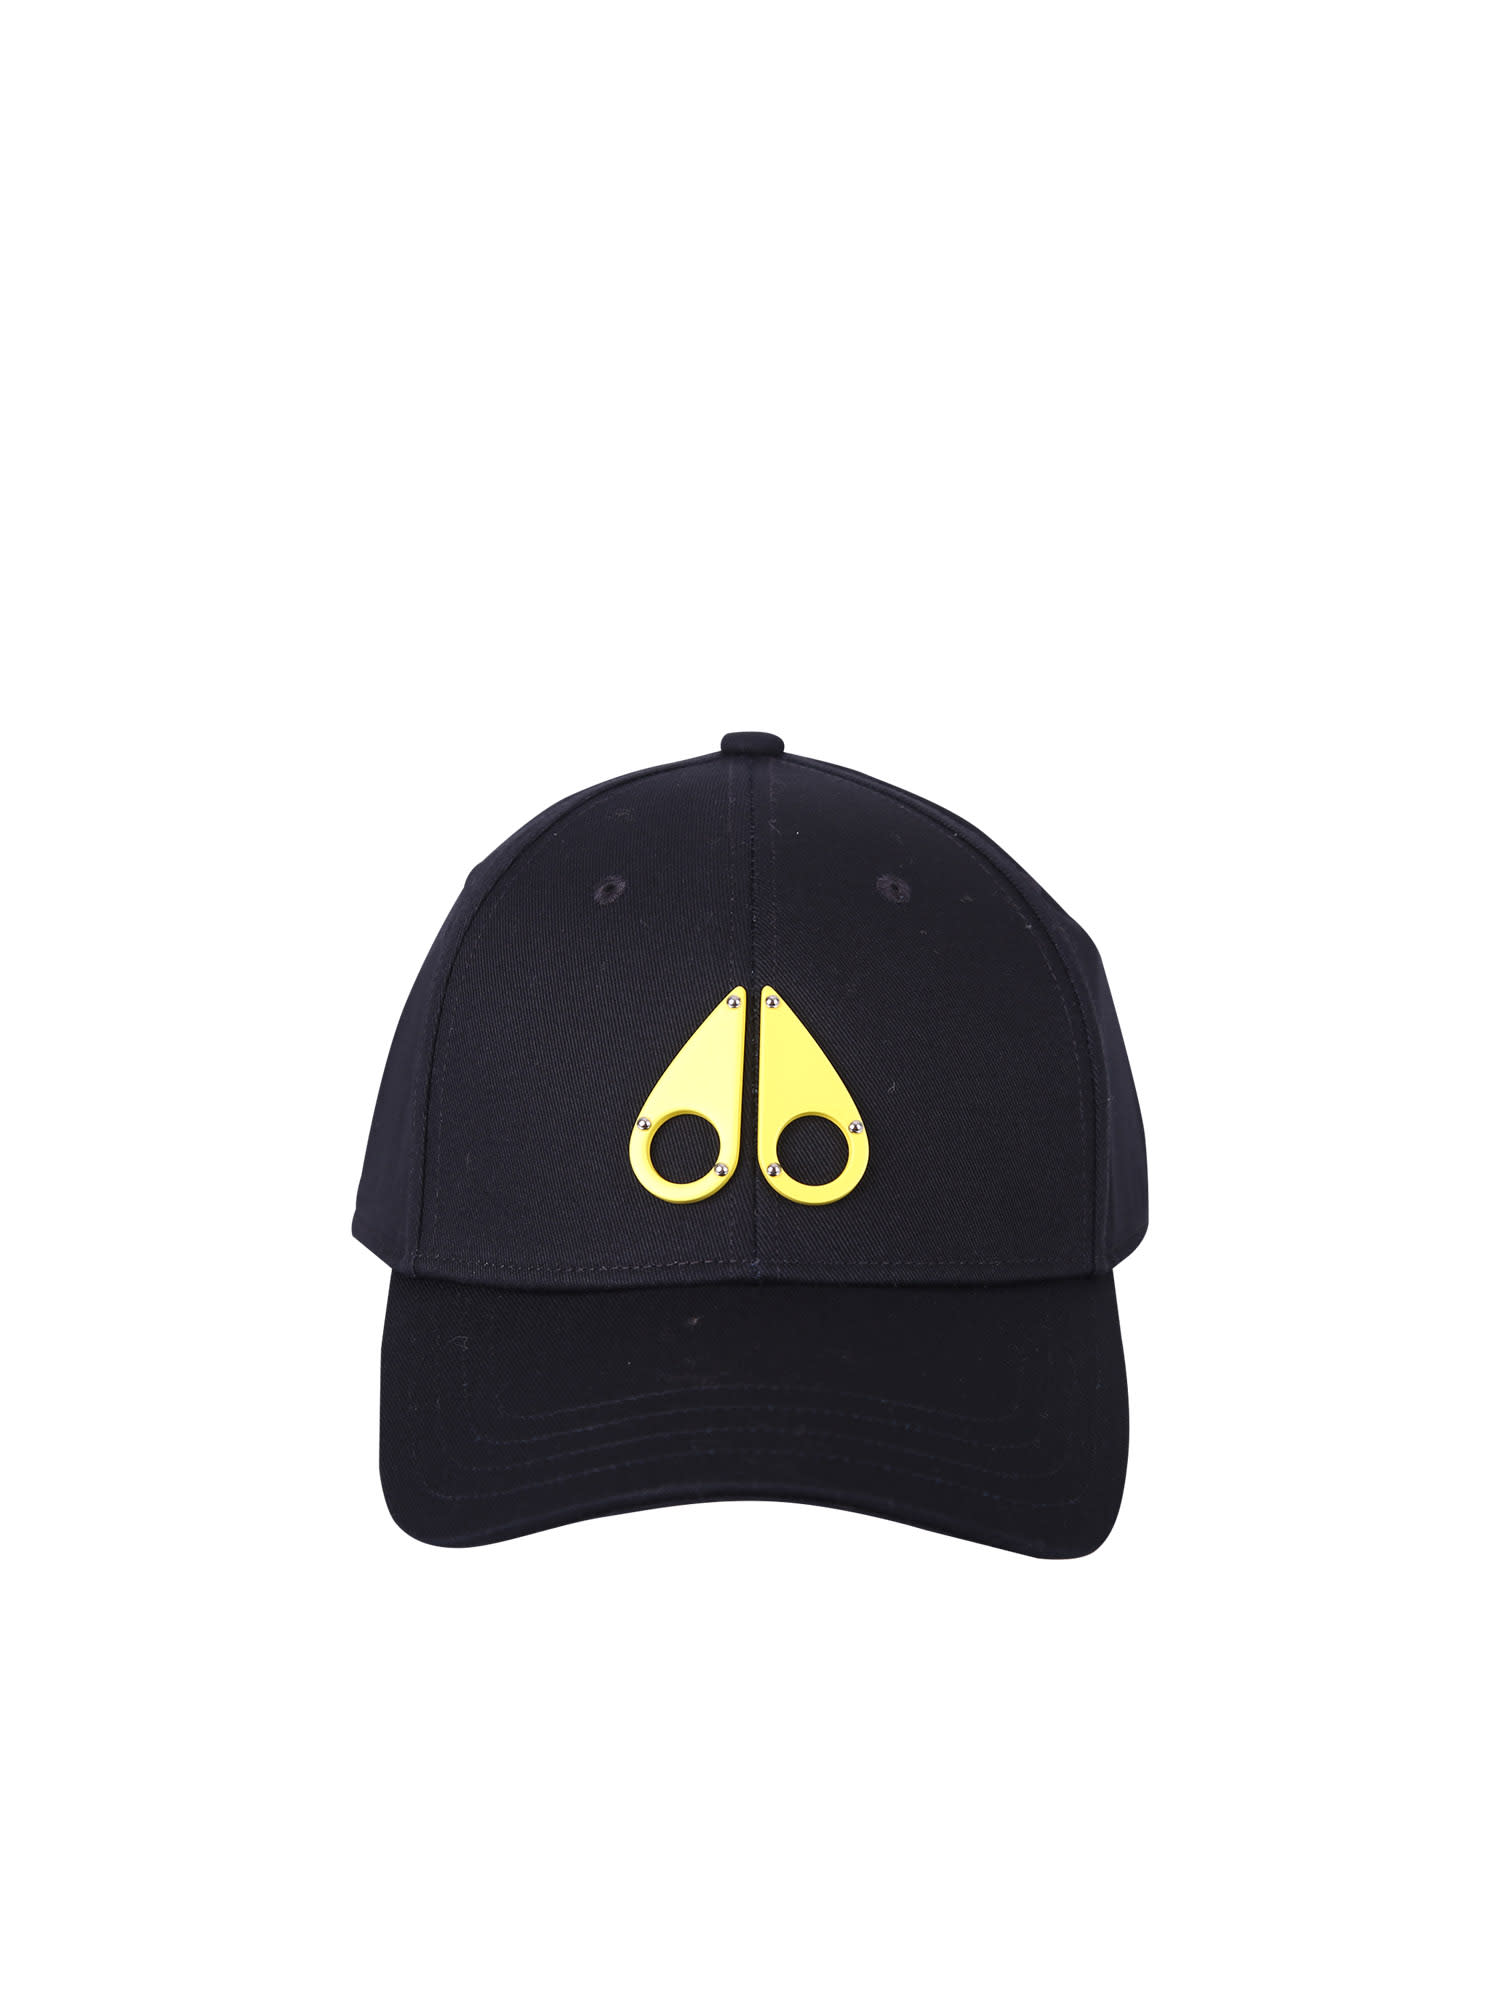 Moose Knuckles Caps BASEBALL HAT